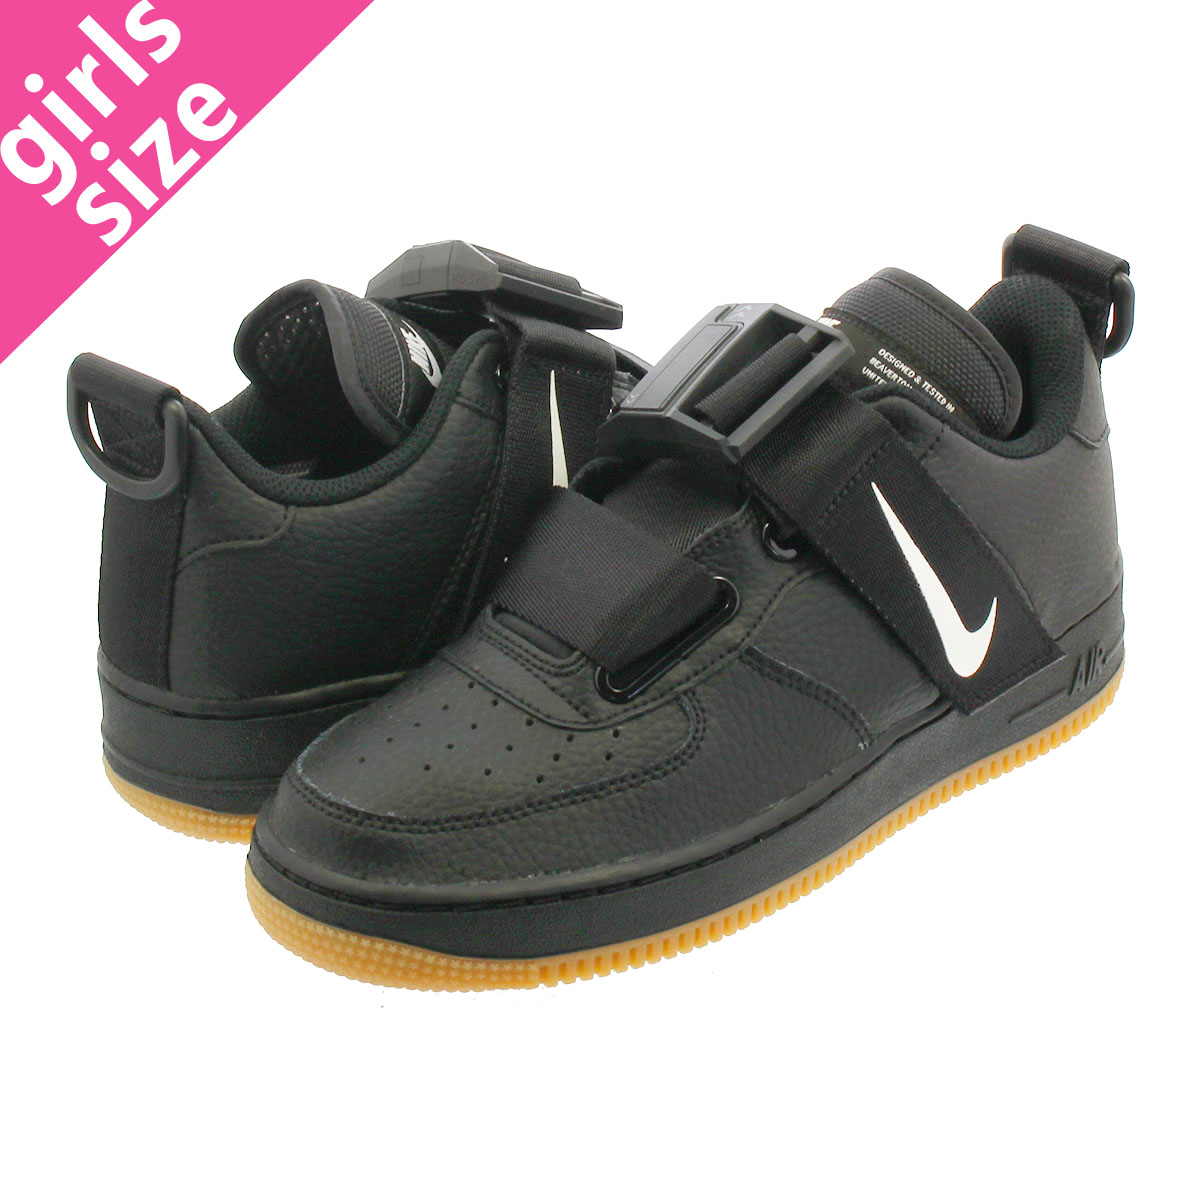 NIKE AIR FORCE 1 UTILITY GS Nike air force 1 UTILITY GS BLACKWHITEGUM MED BROWN aj6601 003